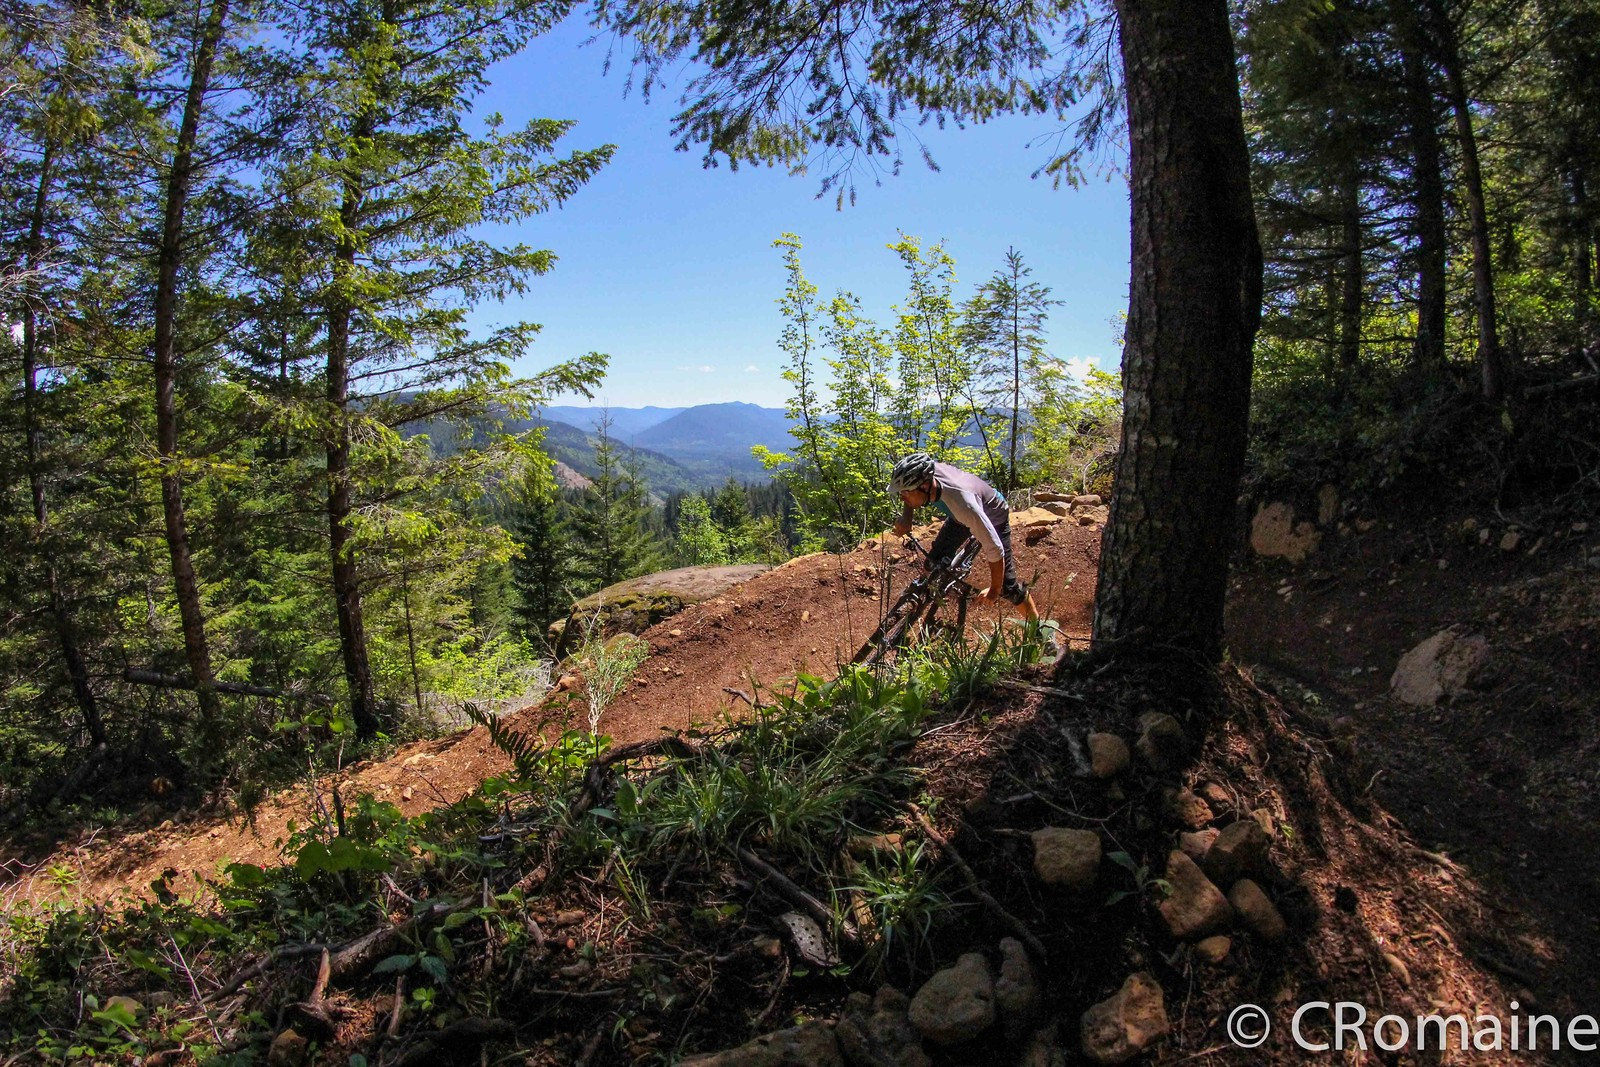 Dennis sandy-2 - Yuroshek - Mountain Biking Pictures - Vital MTB